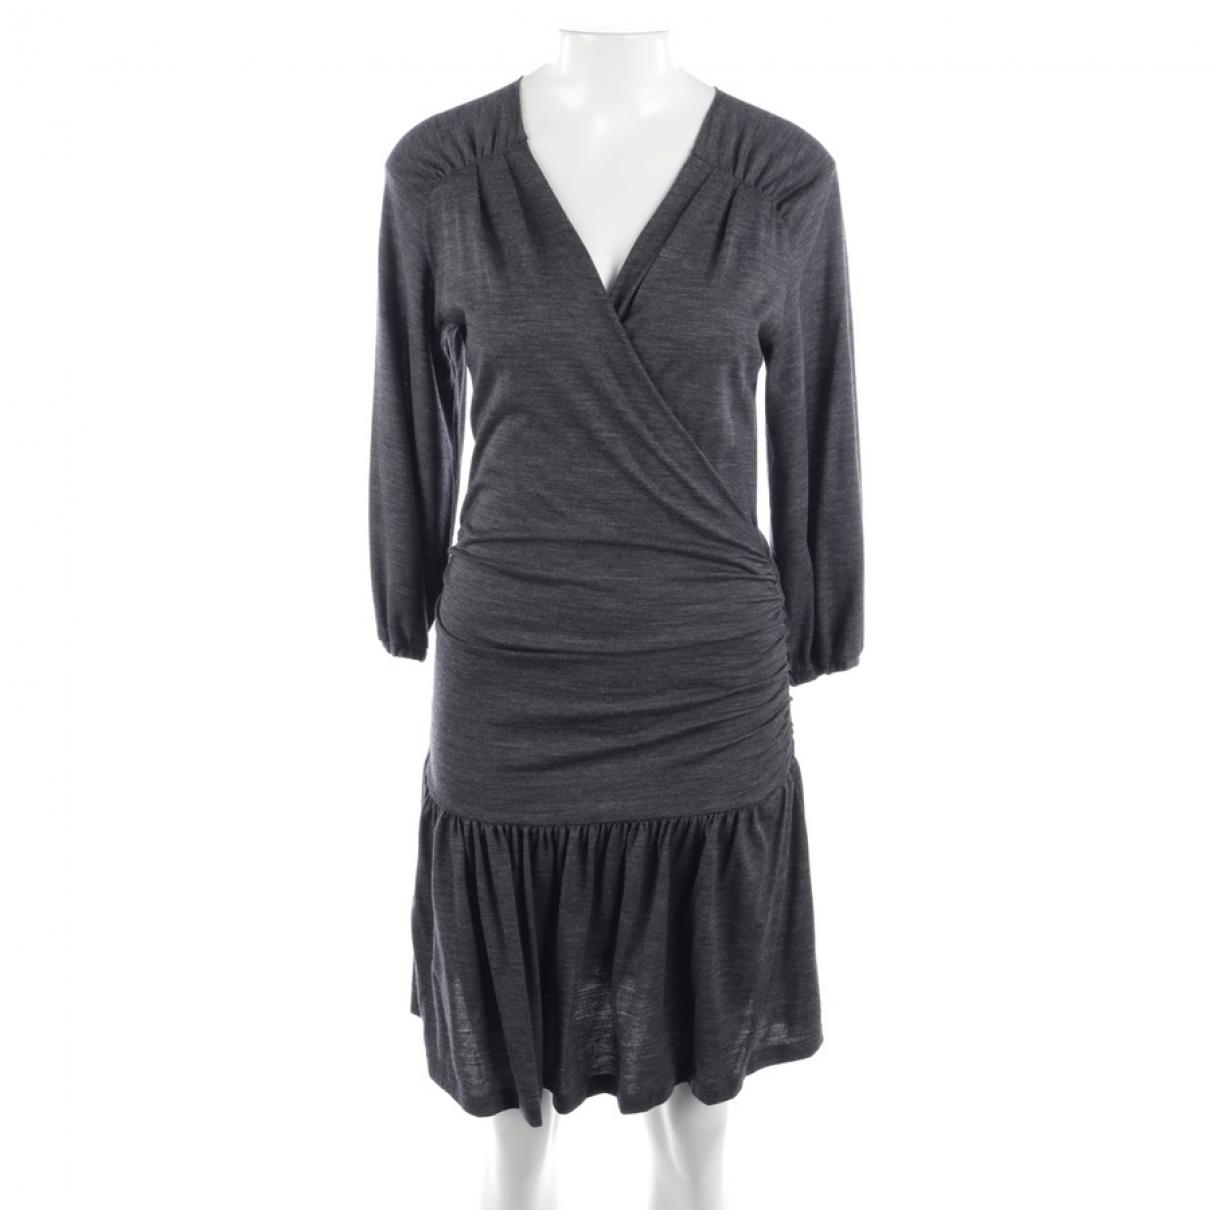 Prada \N Grey dress for Women S International